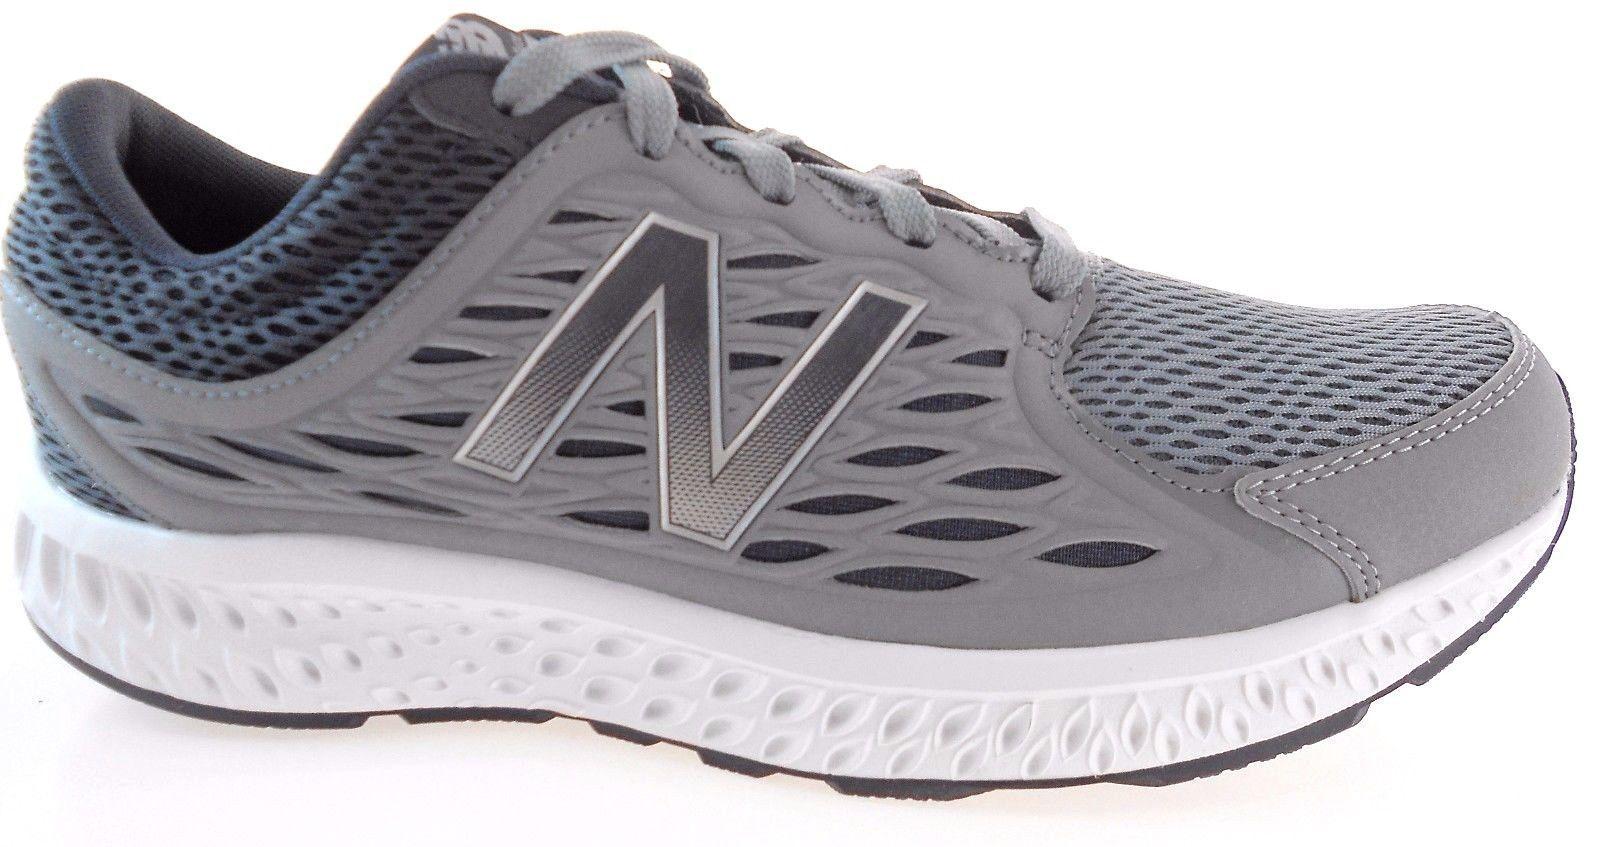 New corriendo Balance 420 V3 420v3 corriendo New Hombre D ancho medio m420ls3 nueva 35329f